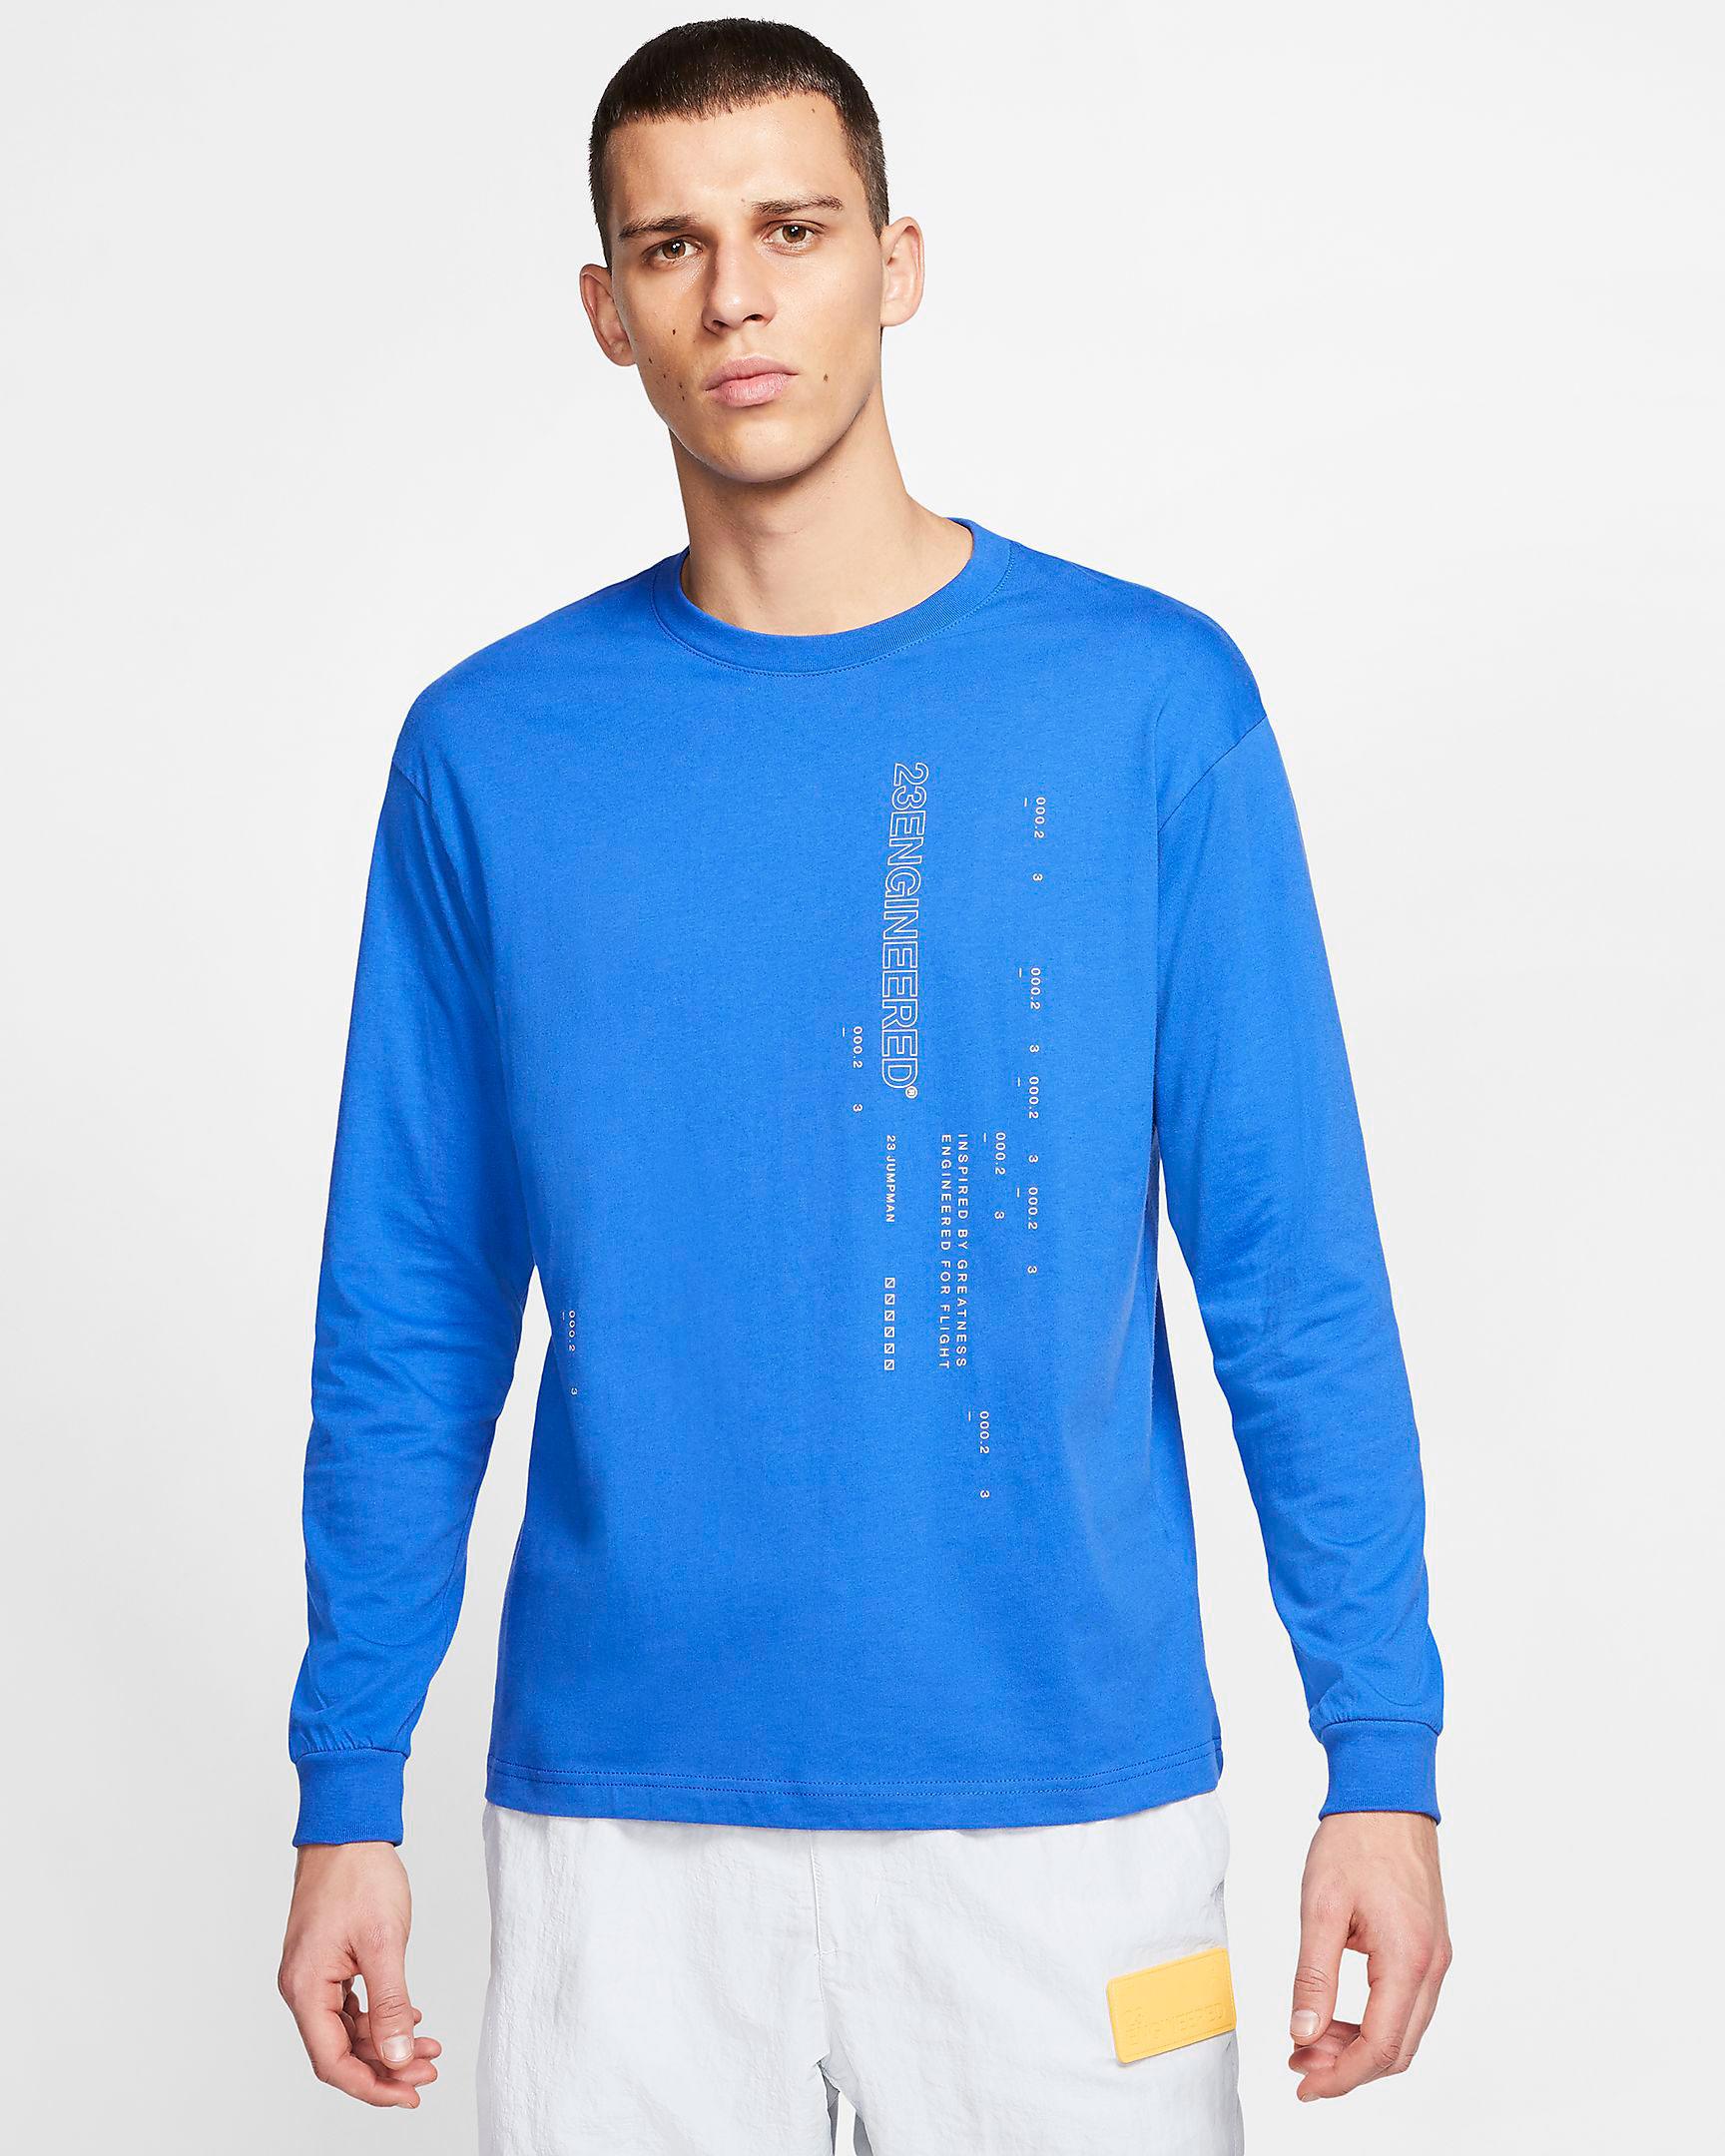 jordan-aerospace-720-lyrical-lemondade-shirt-match-2